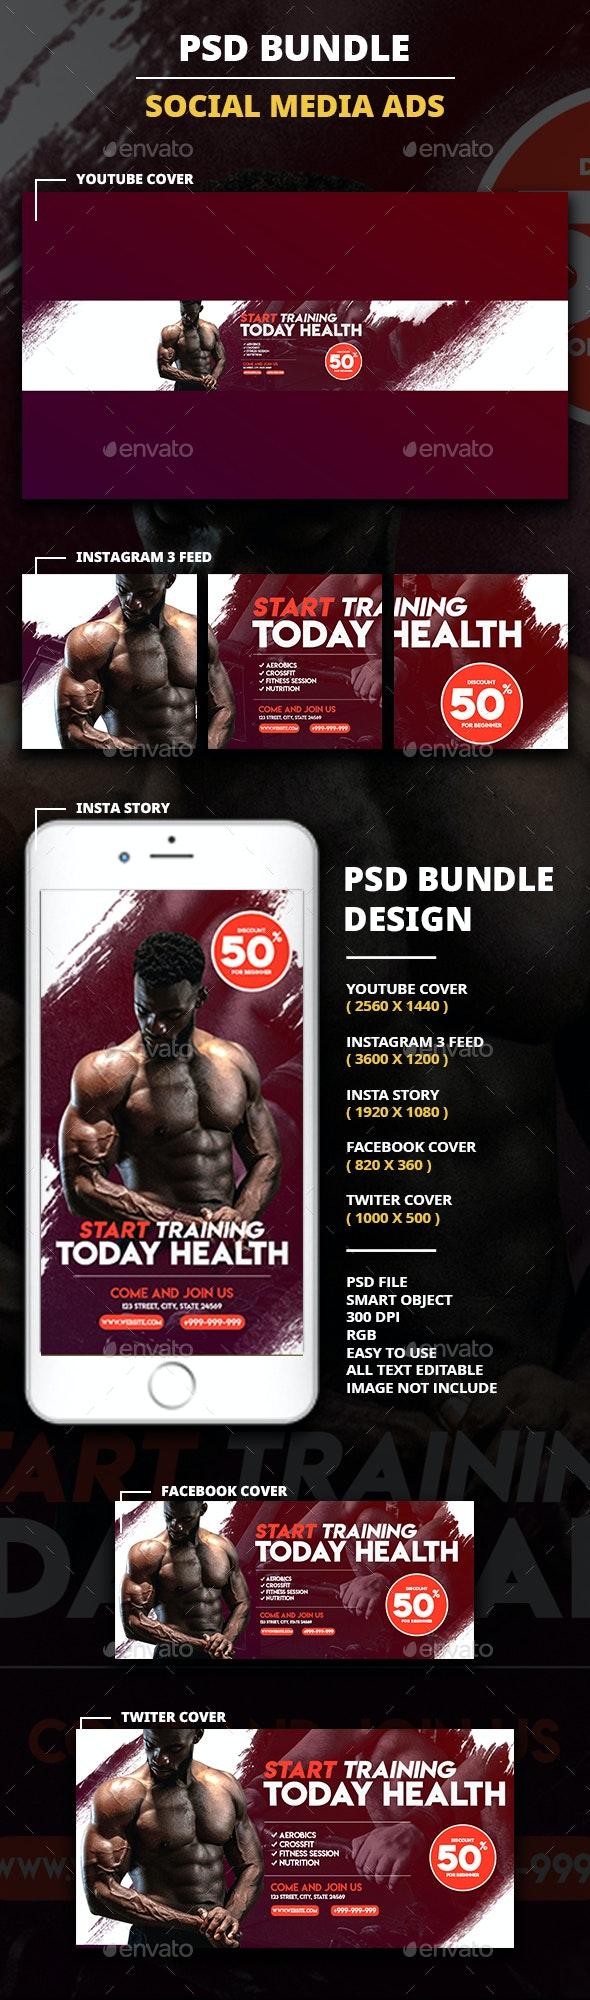 Fitness Social Media Pack - Social Media Web Elements